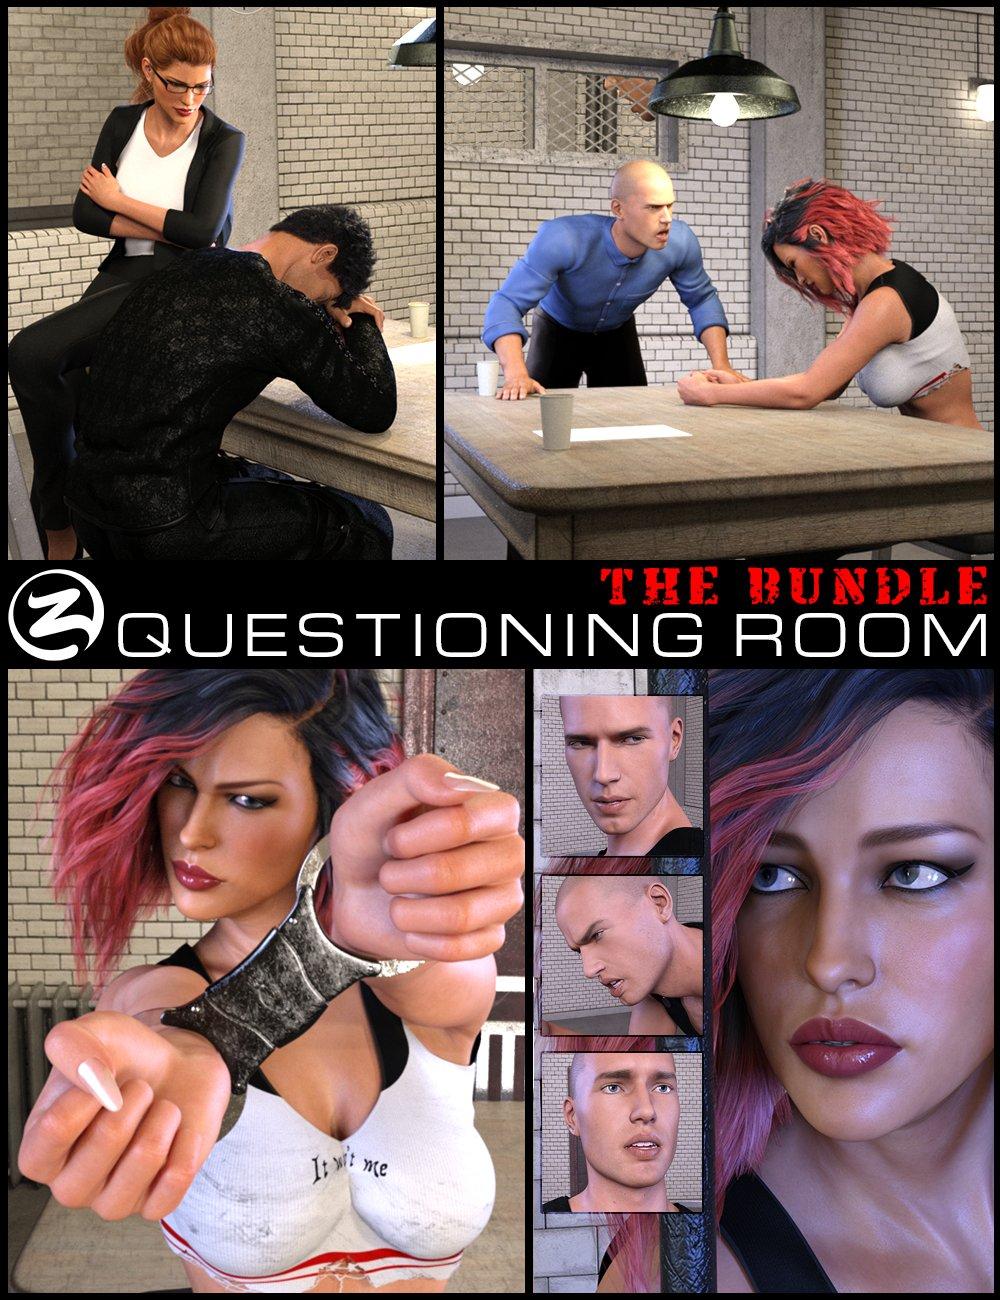 Z Questioning Room Bundle by: Zeddicuss, 3D Models by Daz 3D